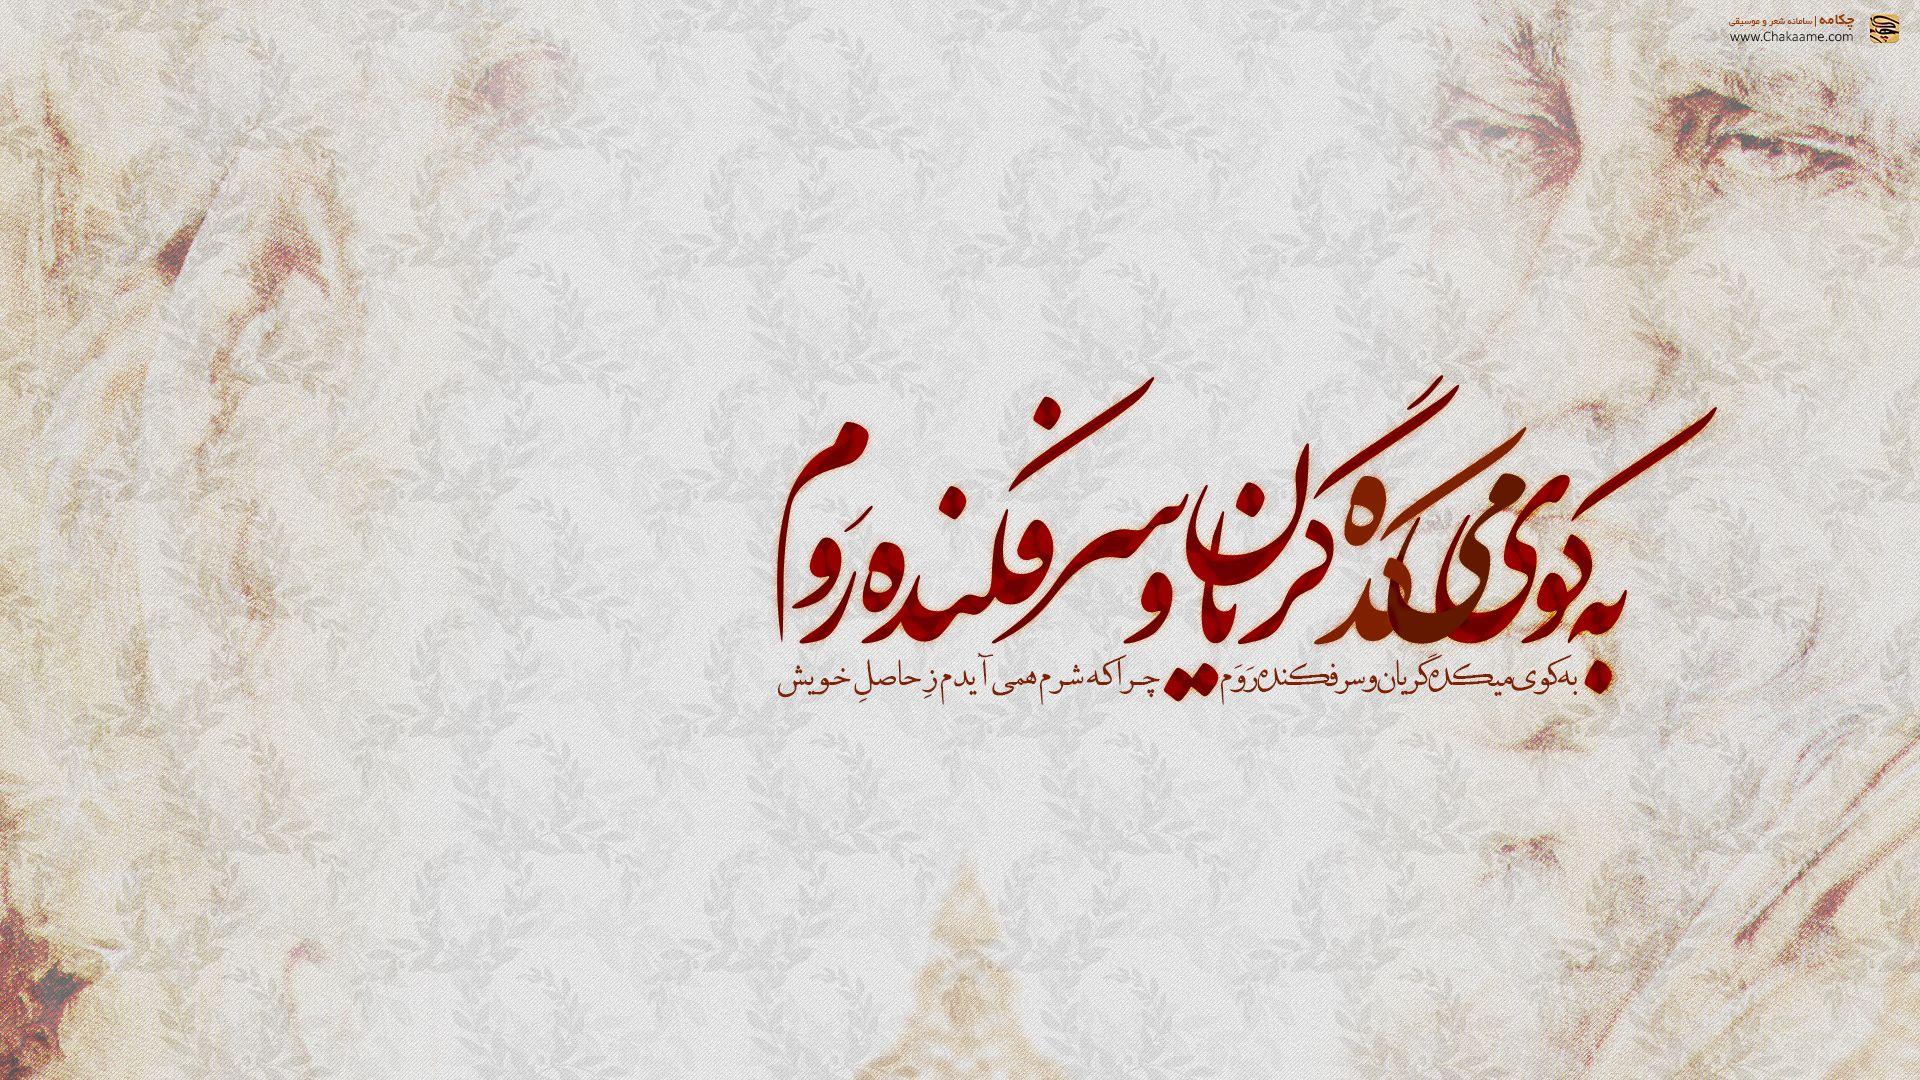 غزل حافظ